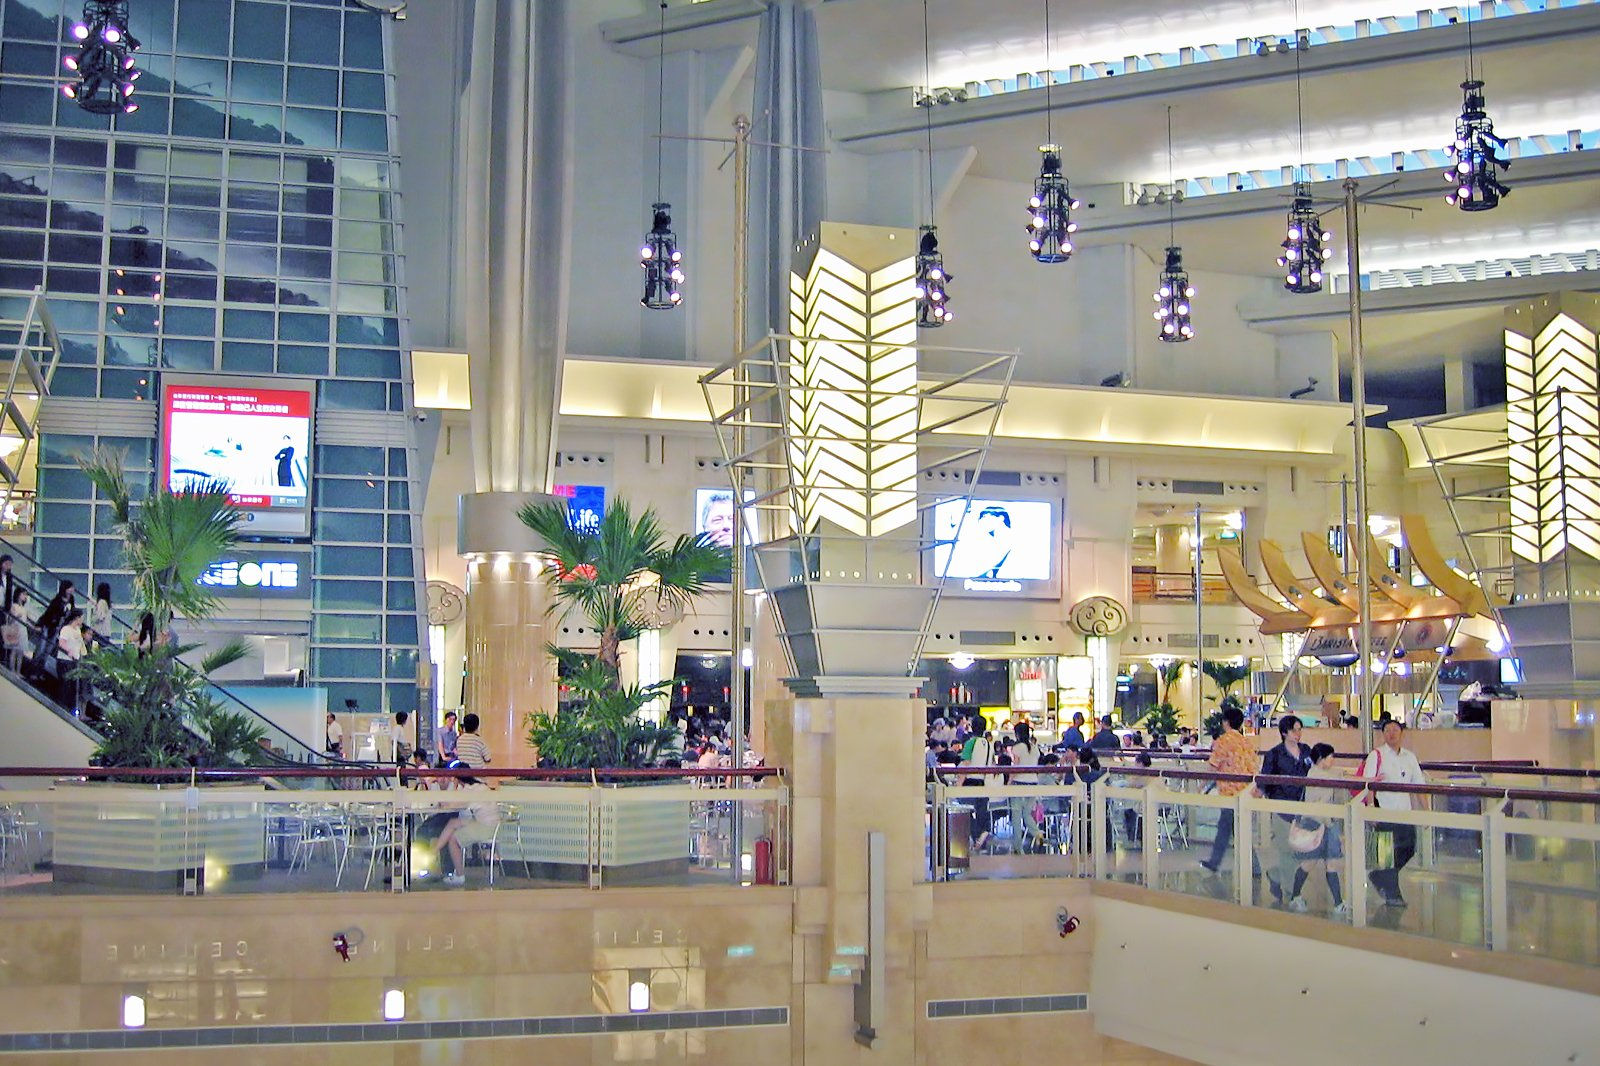 Taipei 101 Shopping Mall - Luxury Shopping in Xinyi District